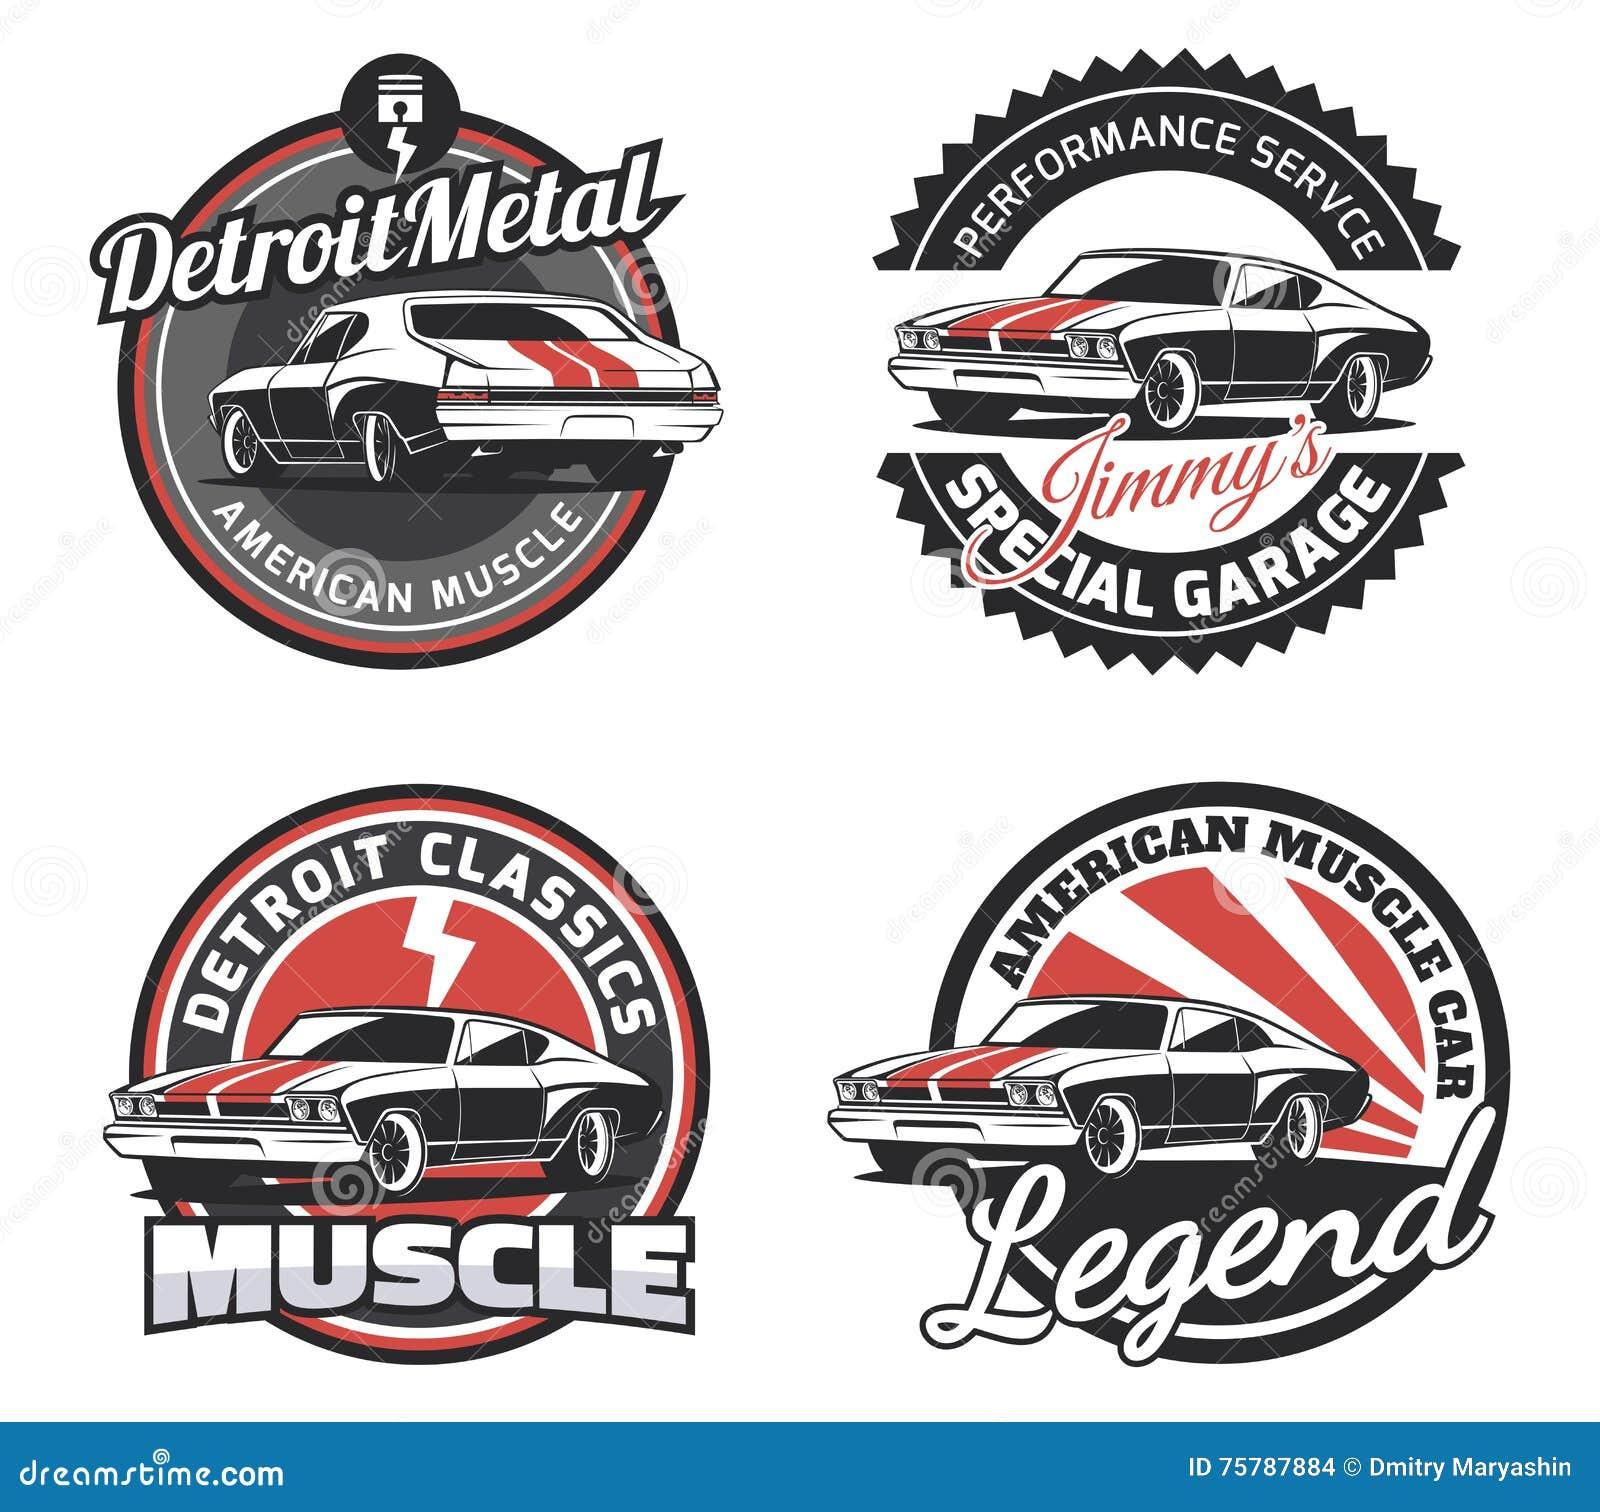 Design car emblem - Set Of Classic Muscle Car Round Emblems Badges And Signs